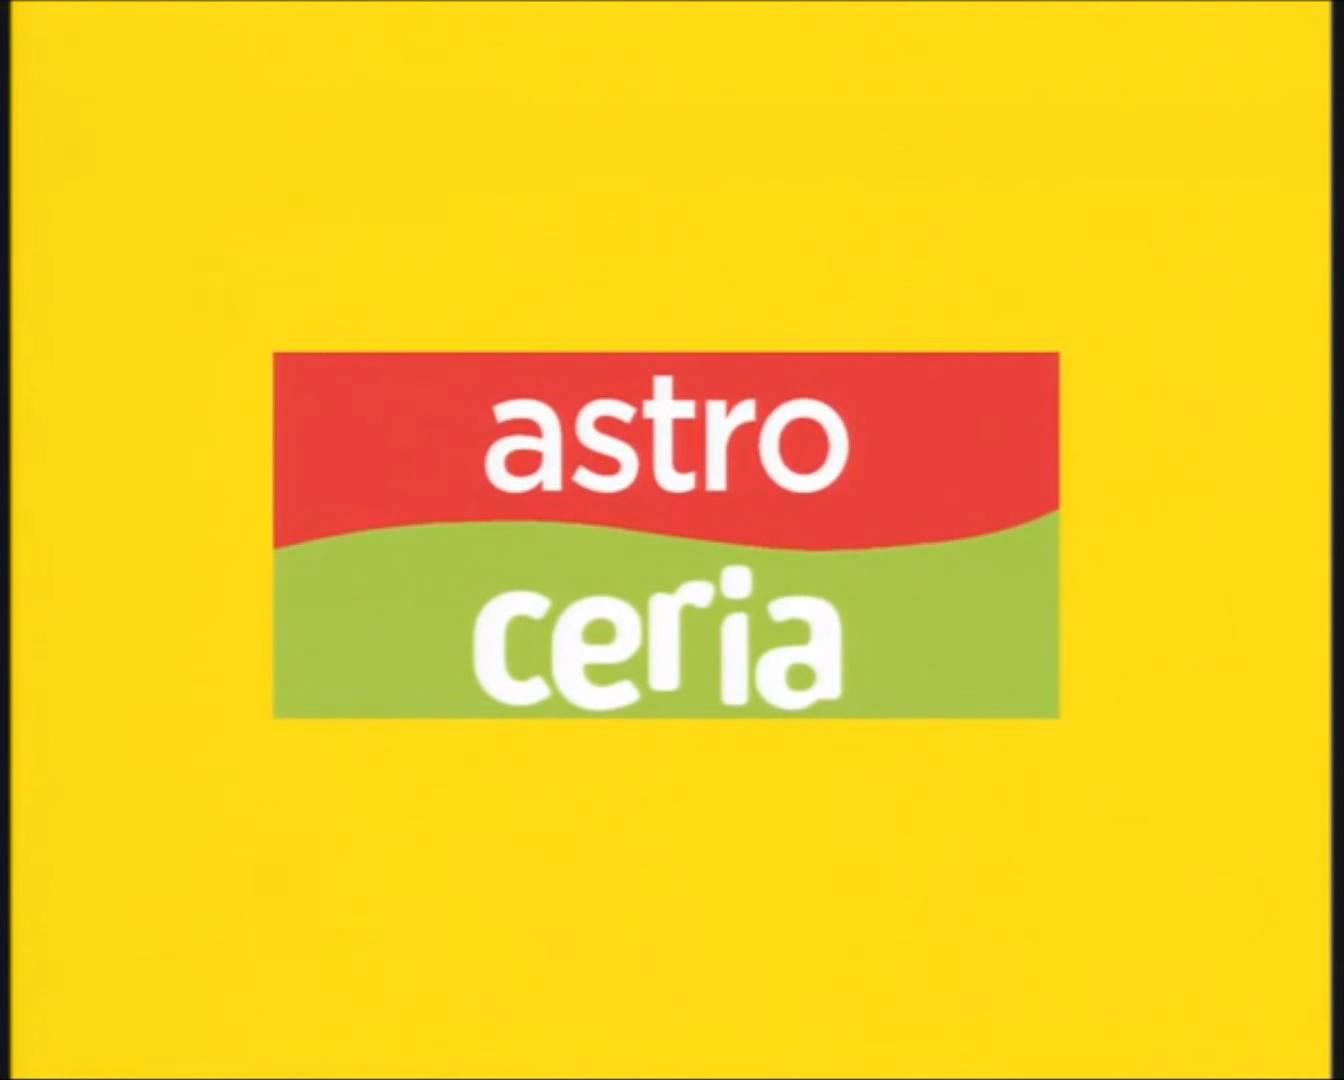 Astro Ceria/Other